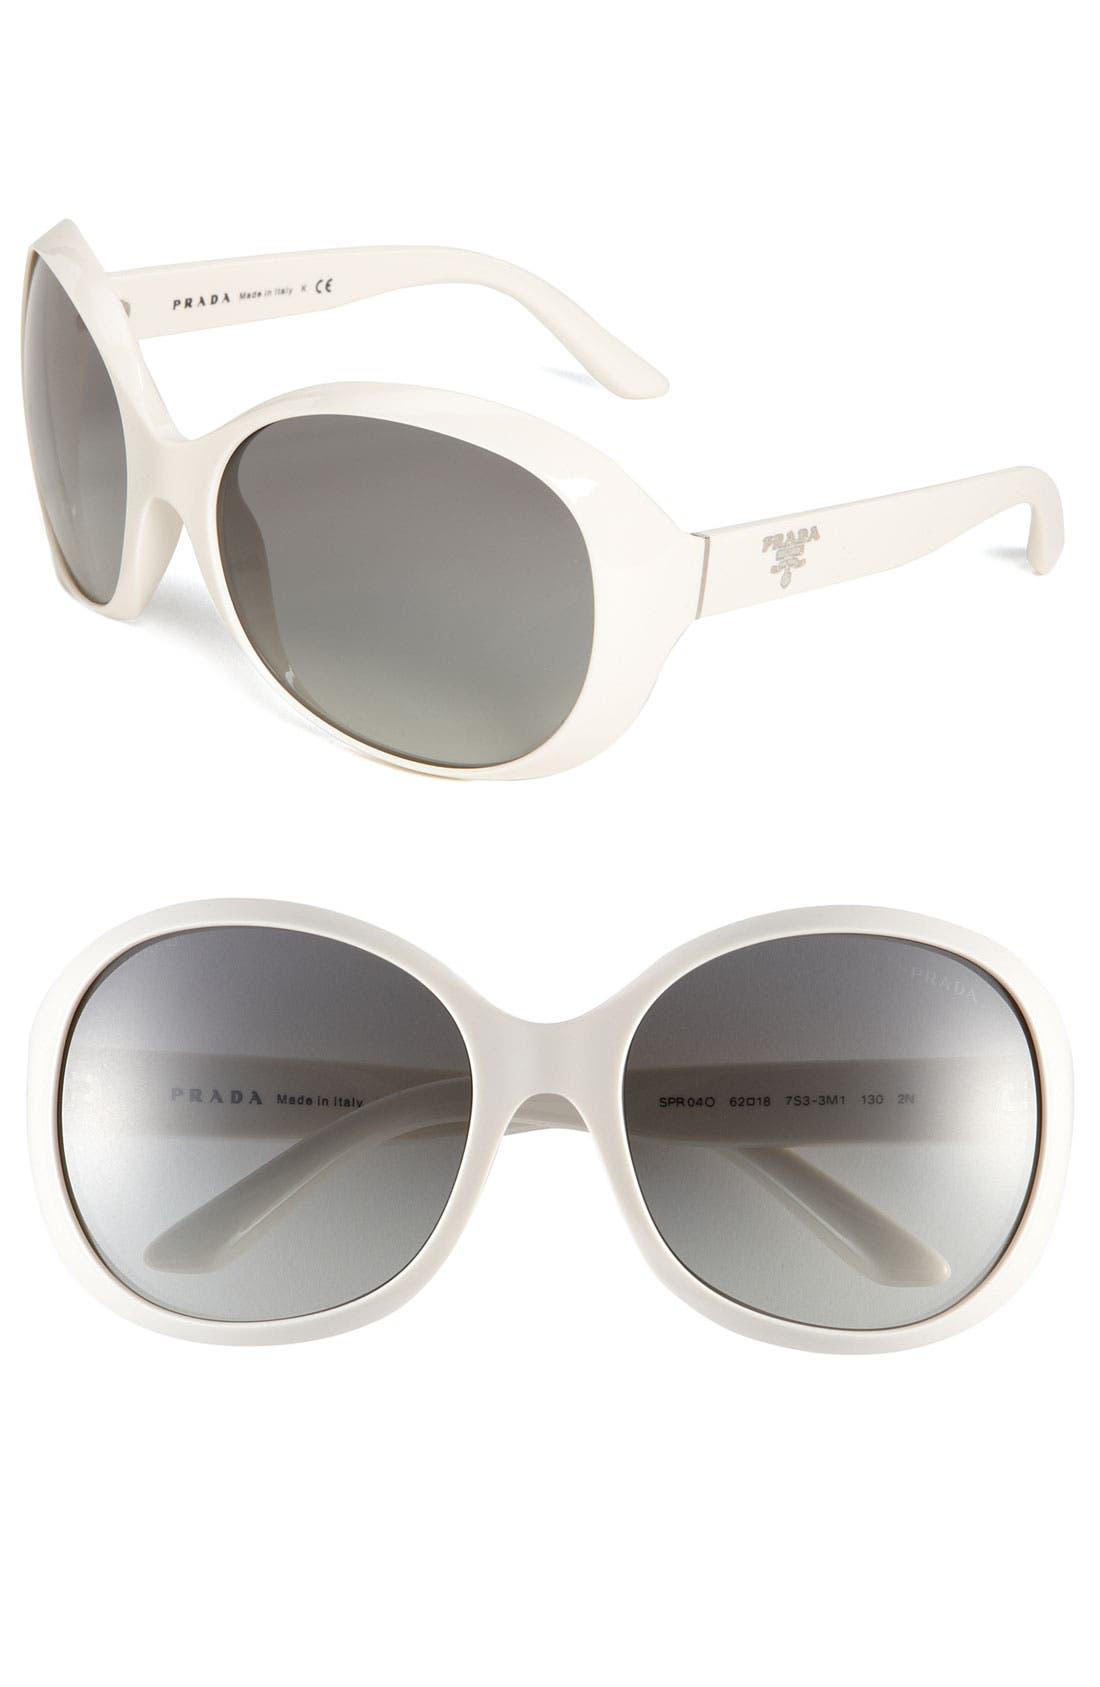 Main Image - Prada 60mm Retro Sunglasses